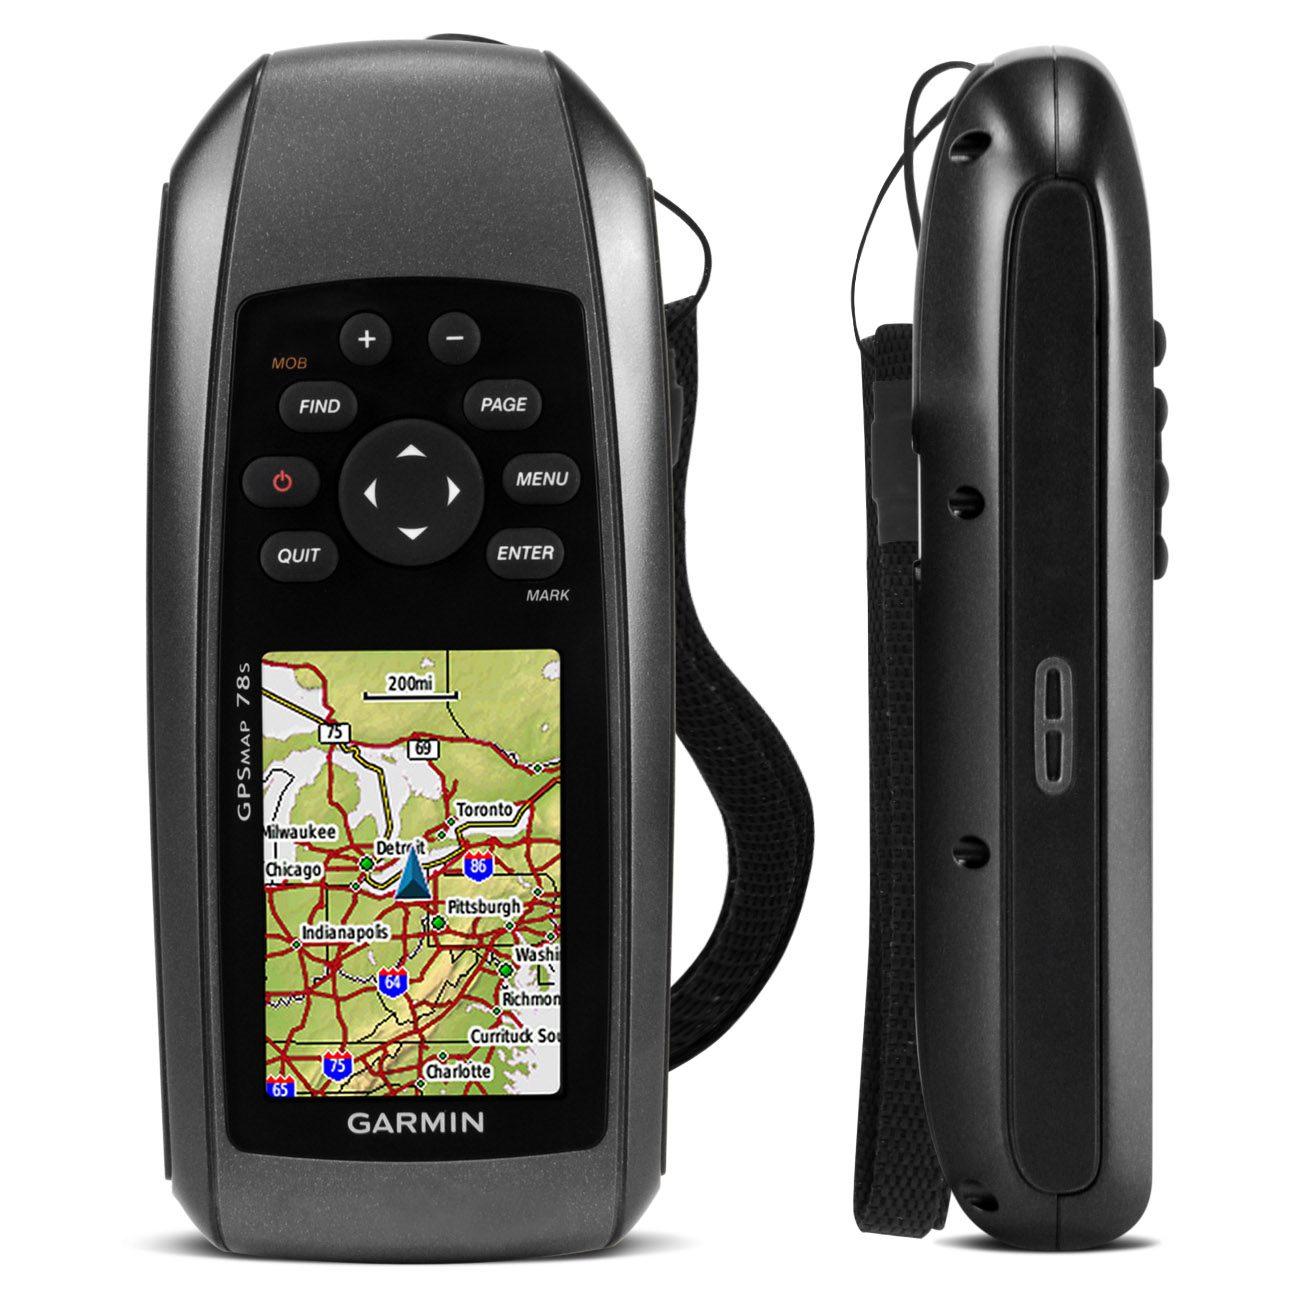 GPS Portátil Garmin 2.6 Polegadas Bússola À Prova de Água Aquático GPSMAP 78s